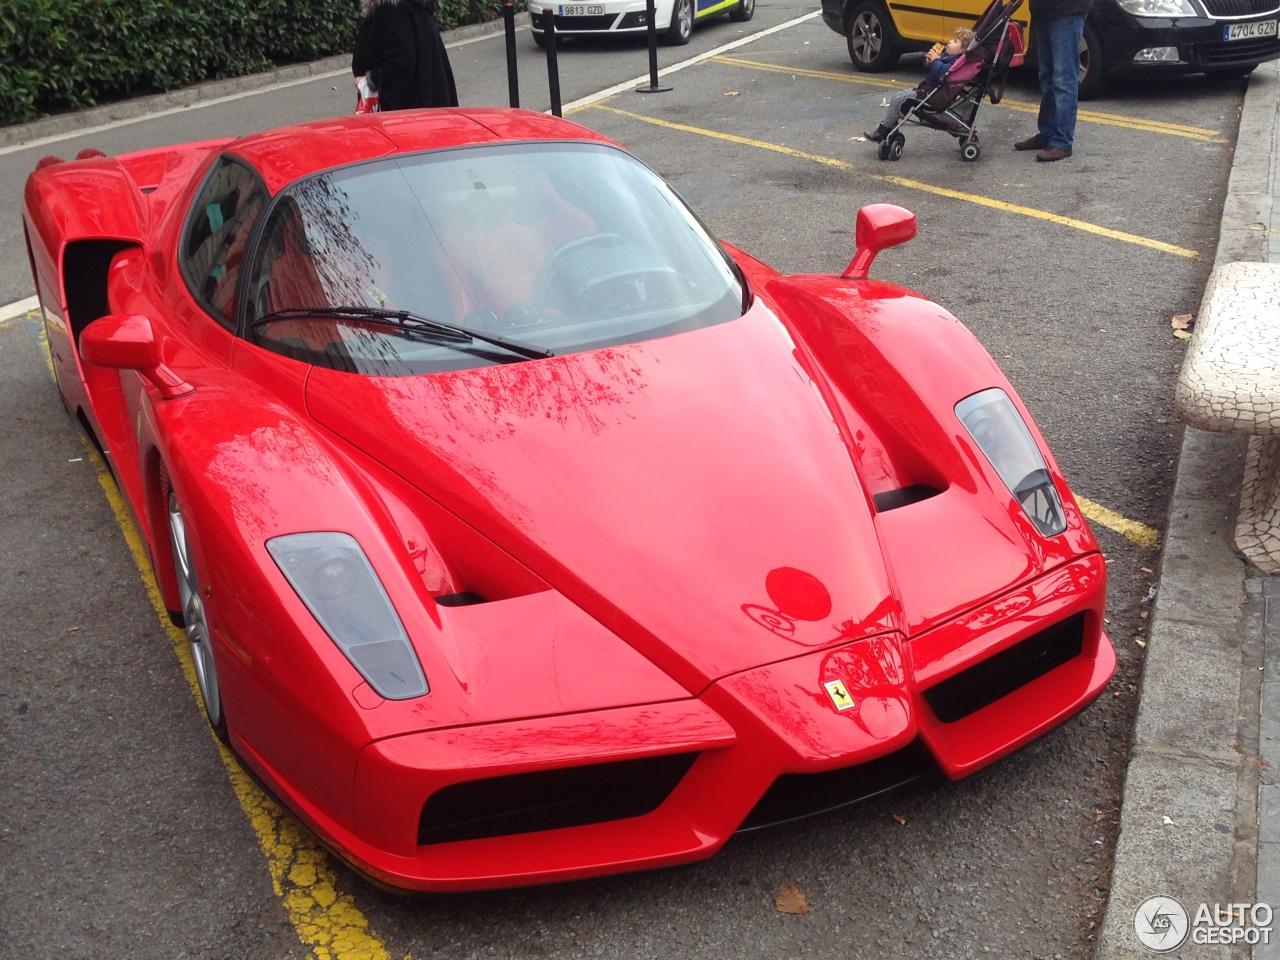 Ferrari Enzo Ferrari  12 January 2014  Autogespot